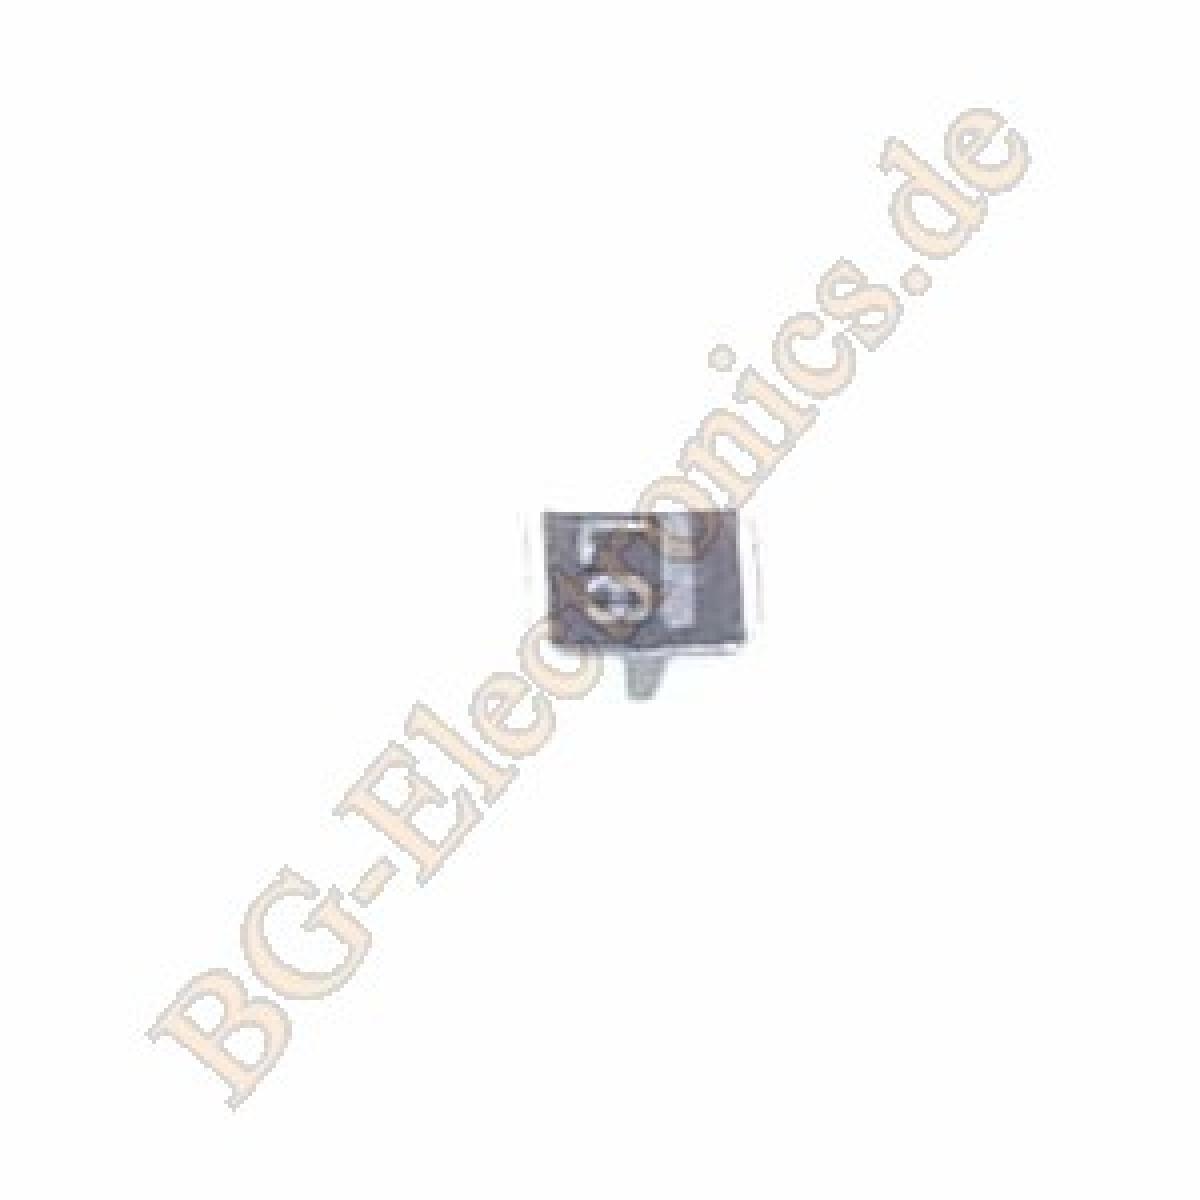 Plcc 32pin Bg Electronics Fassung Socket Plcc 32 Pin